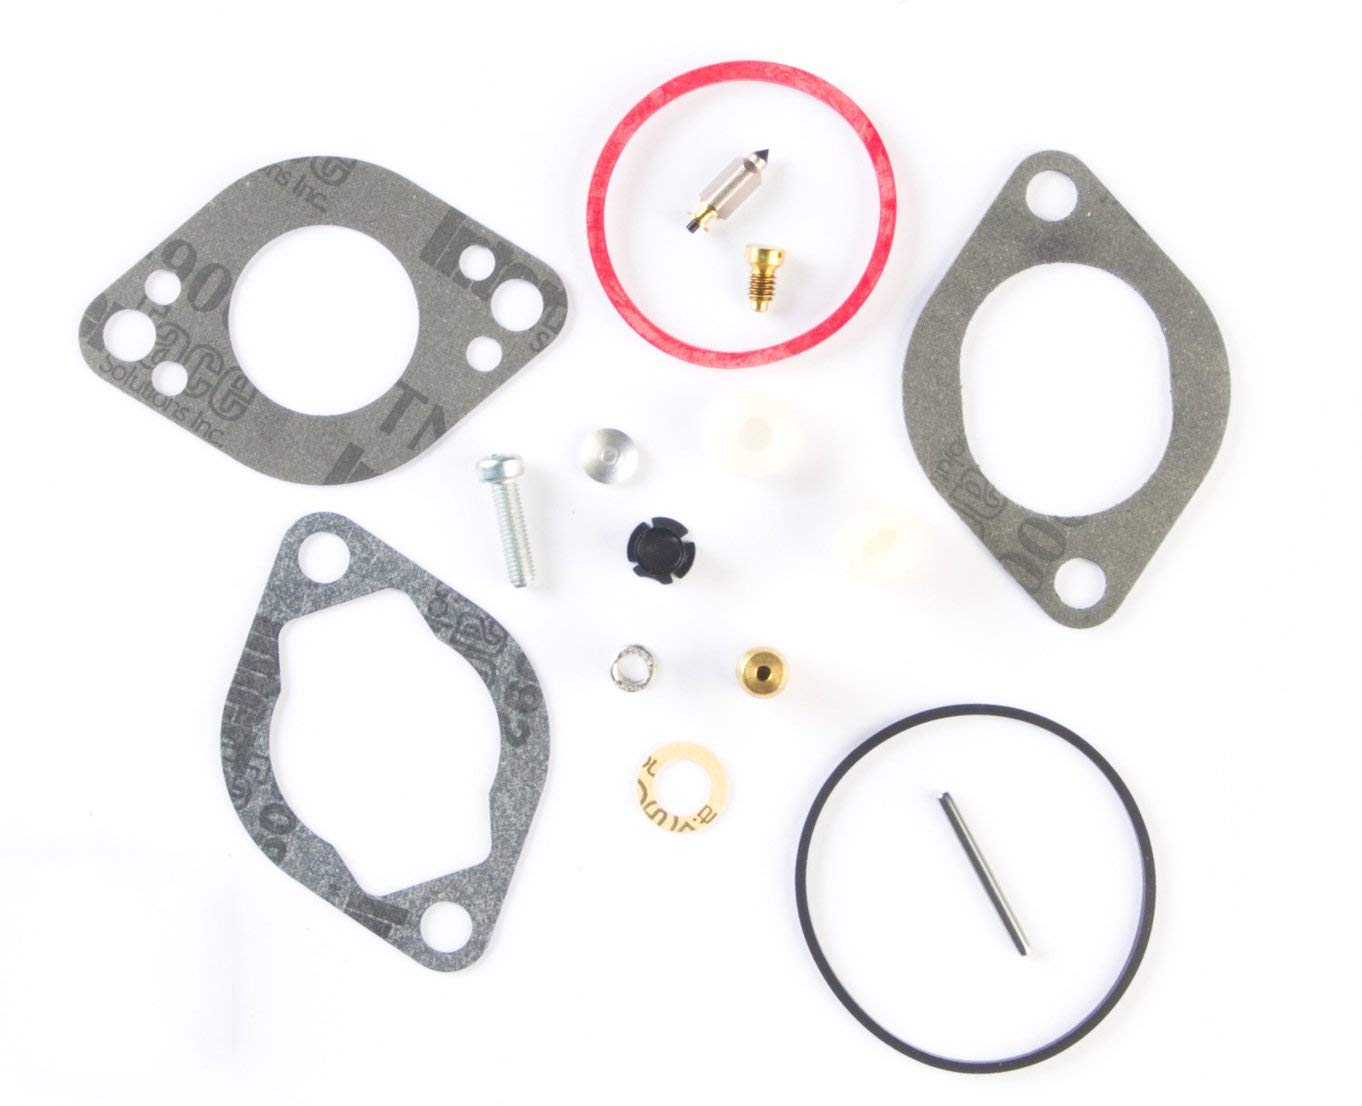 Briggs & Stratton 695441 Carburetor Overhaul Kit Replacement Part